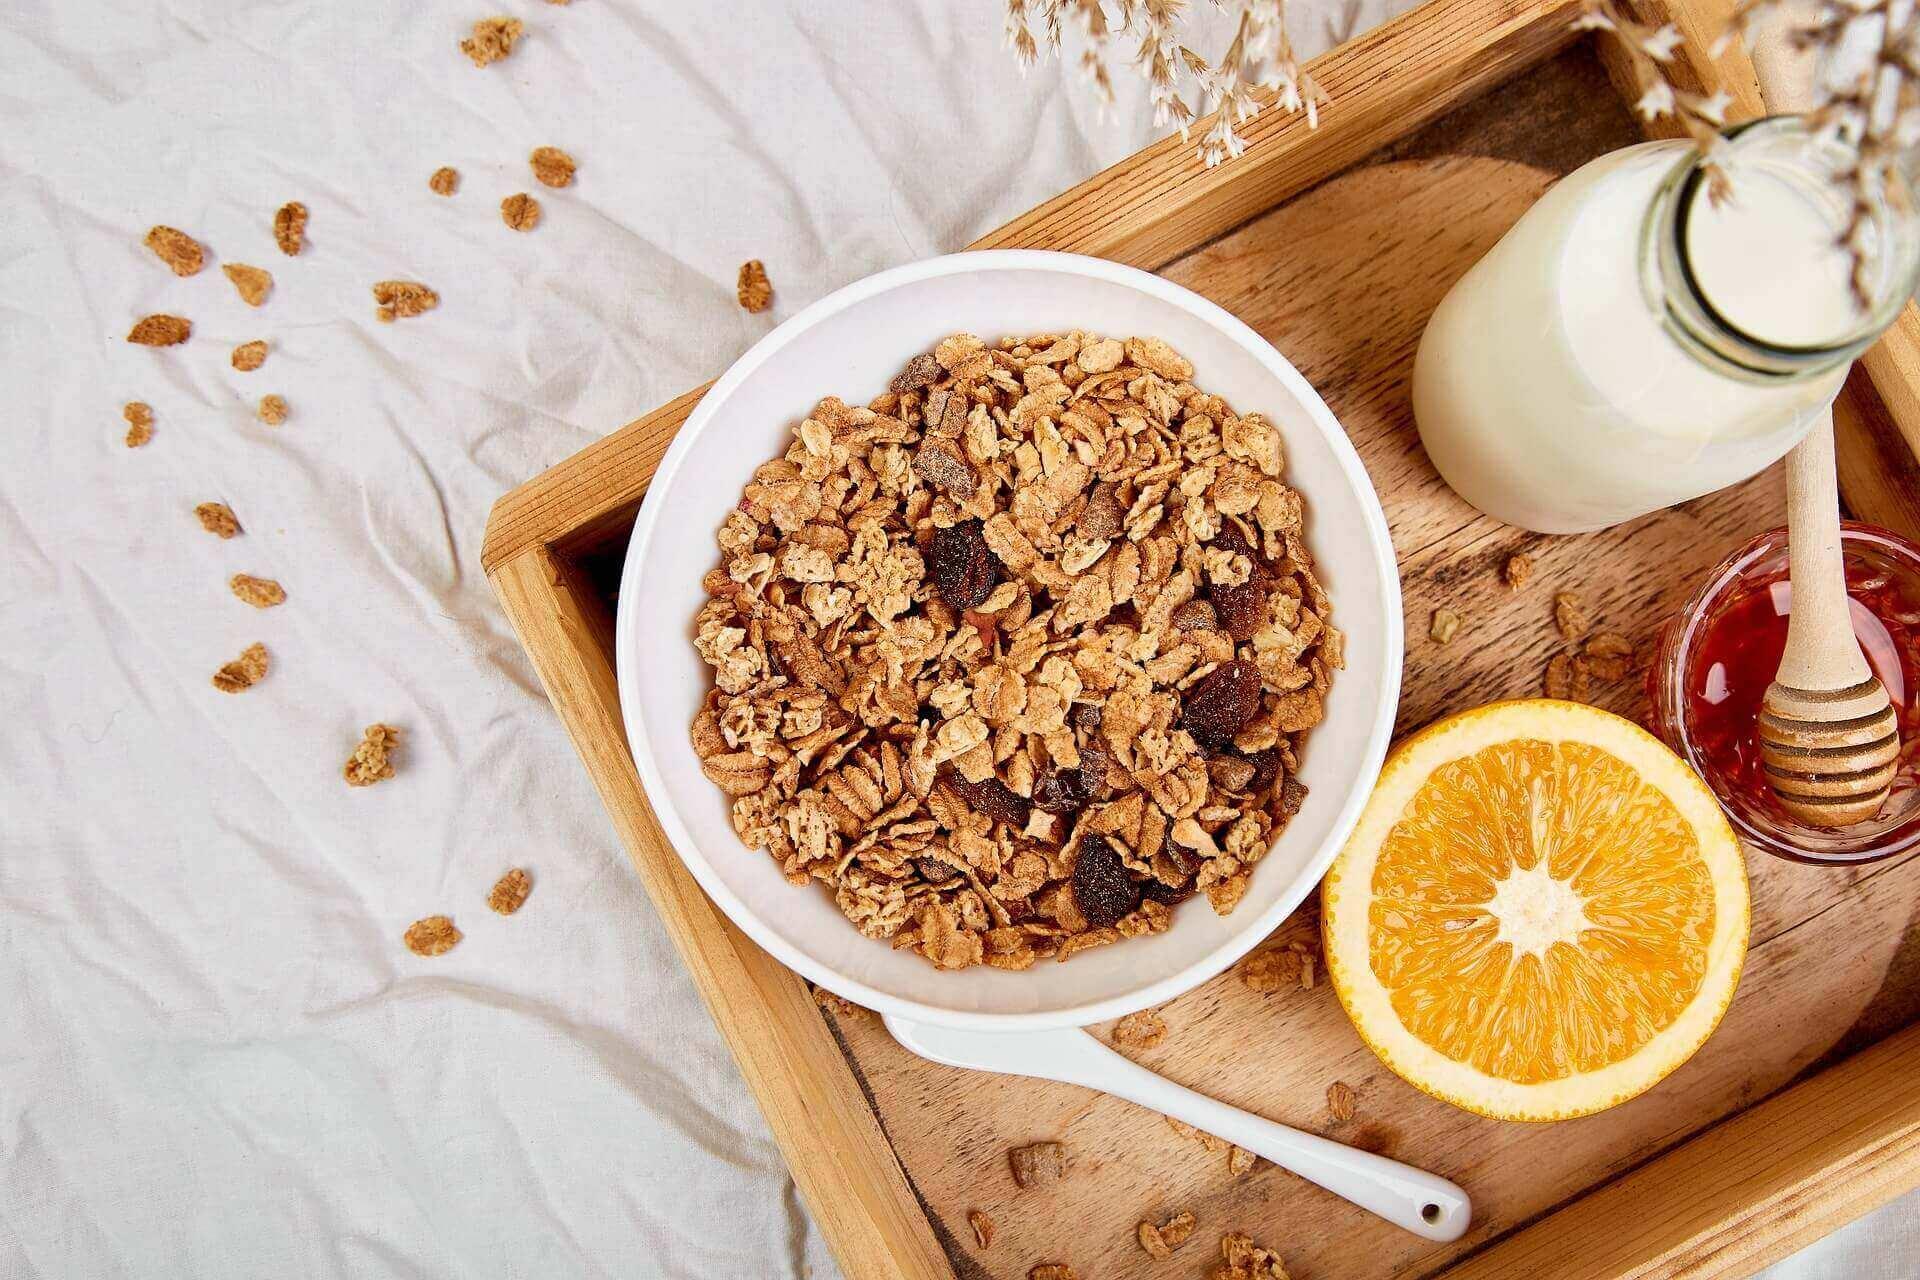 Grain-free, gluten-free muesli recipe